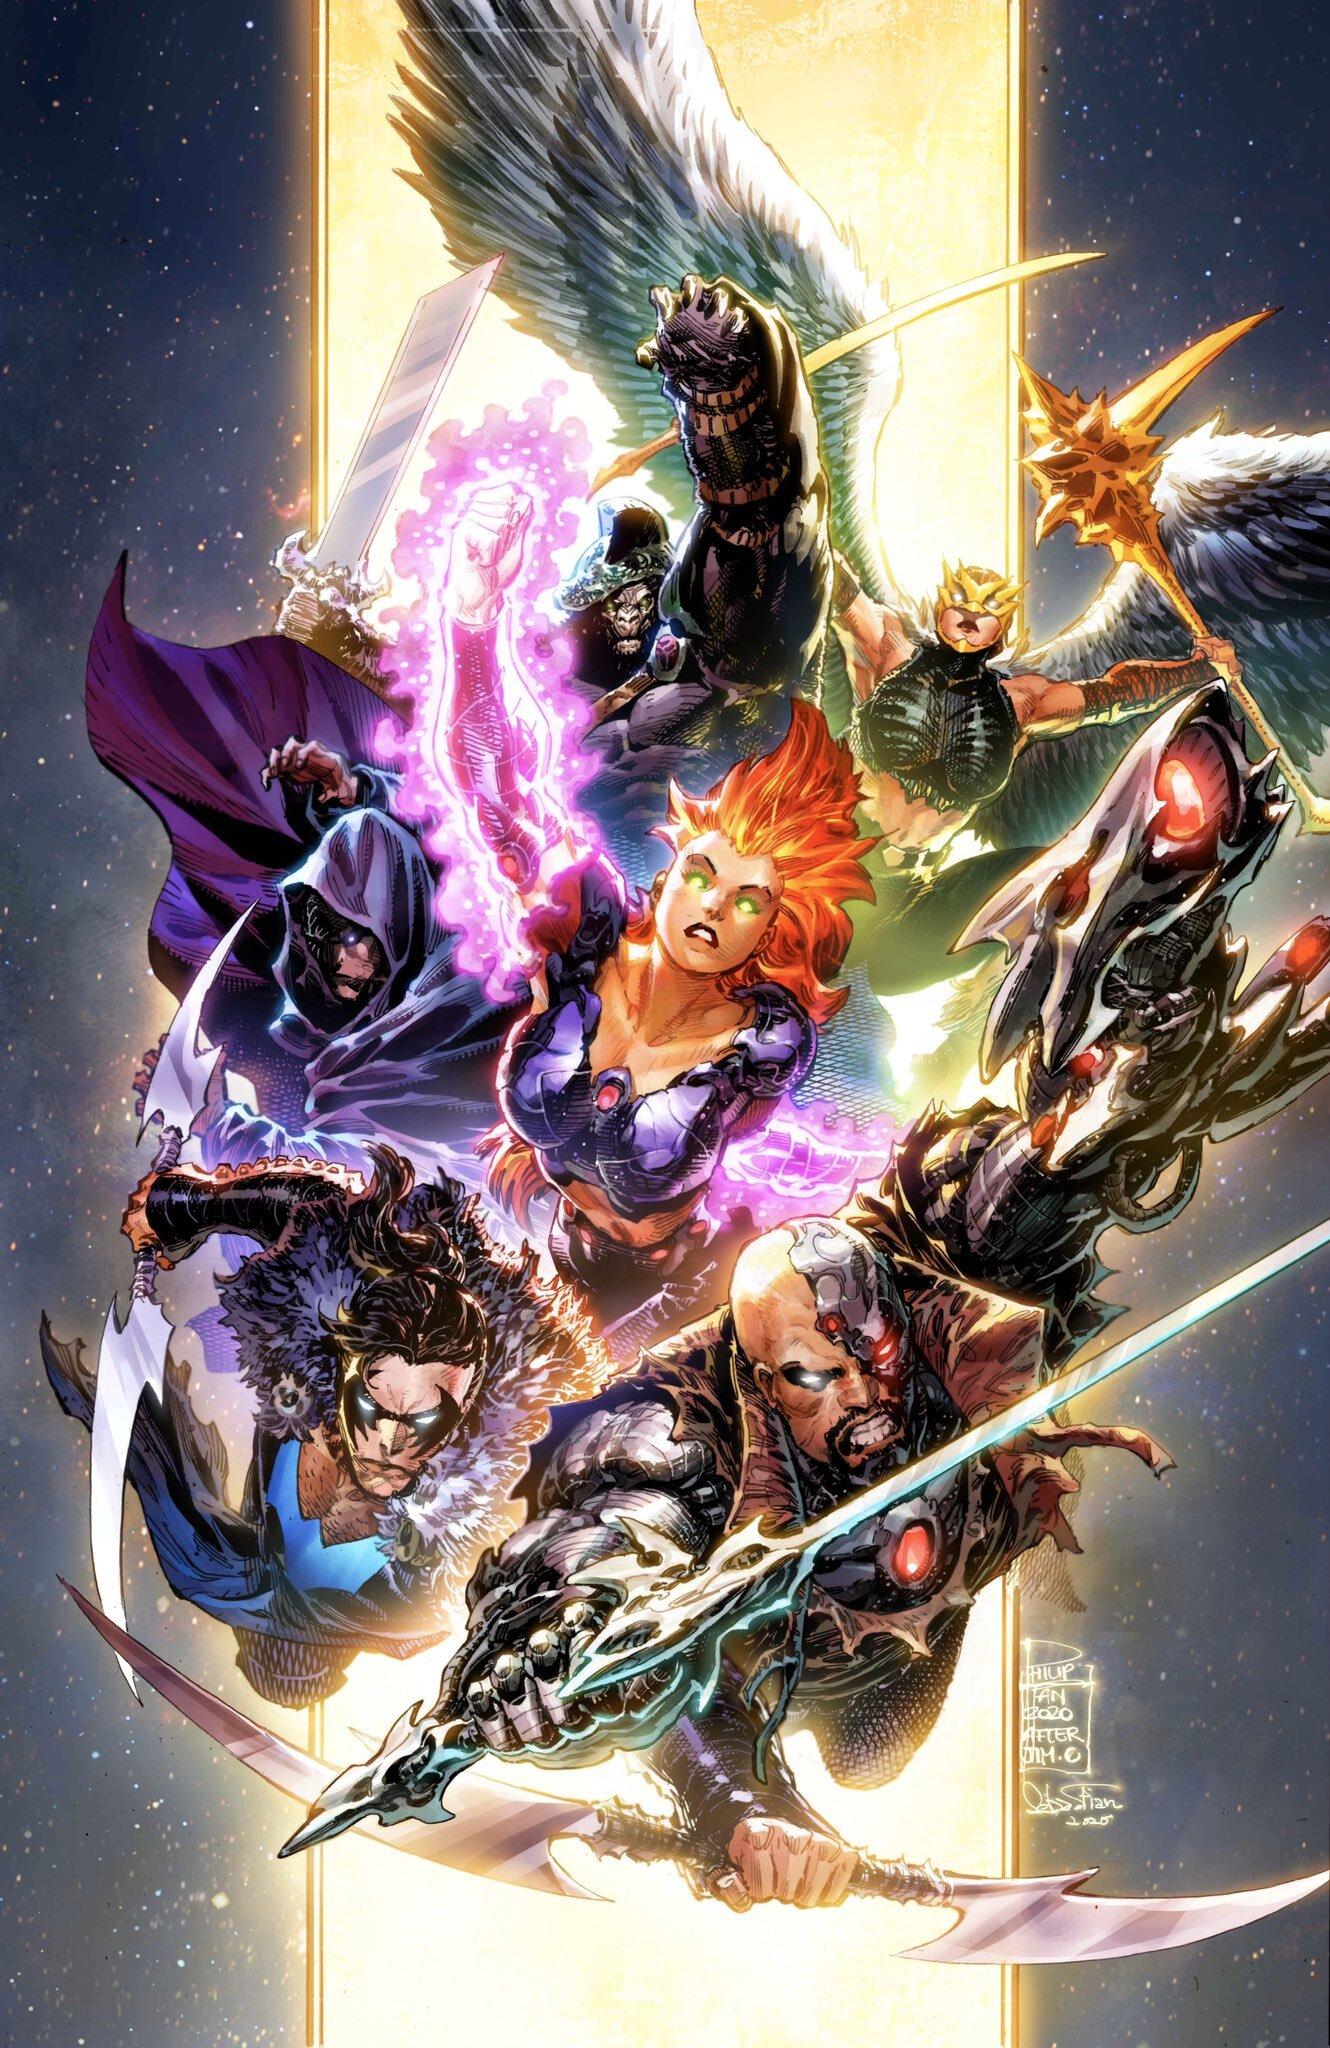 Justice League Vol 4 57 Textless Variant.jpg